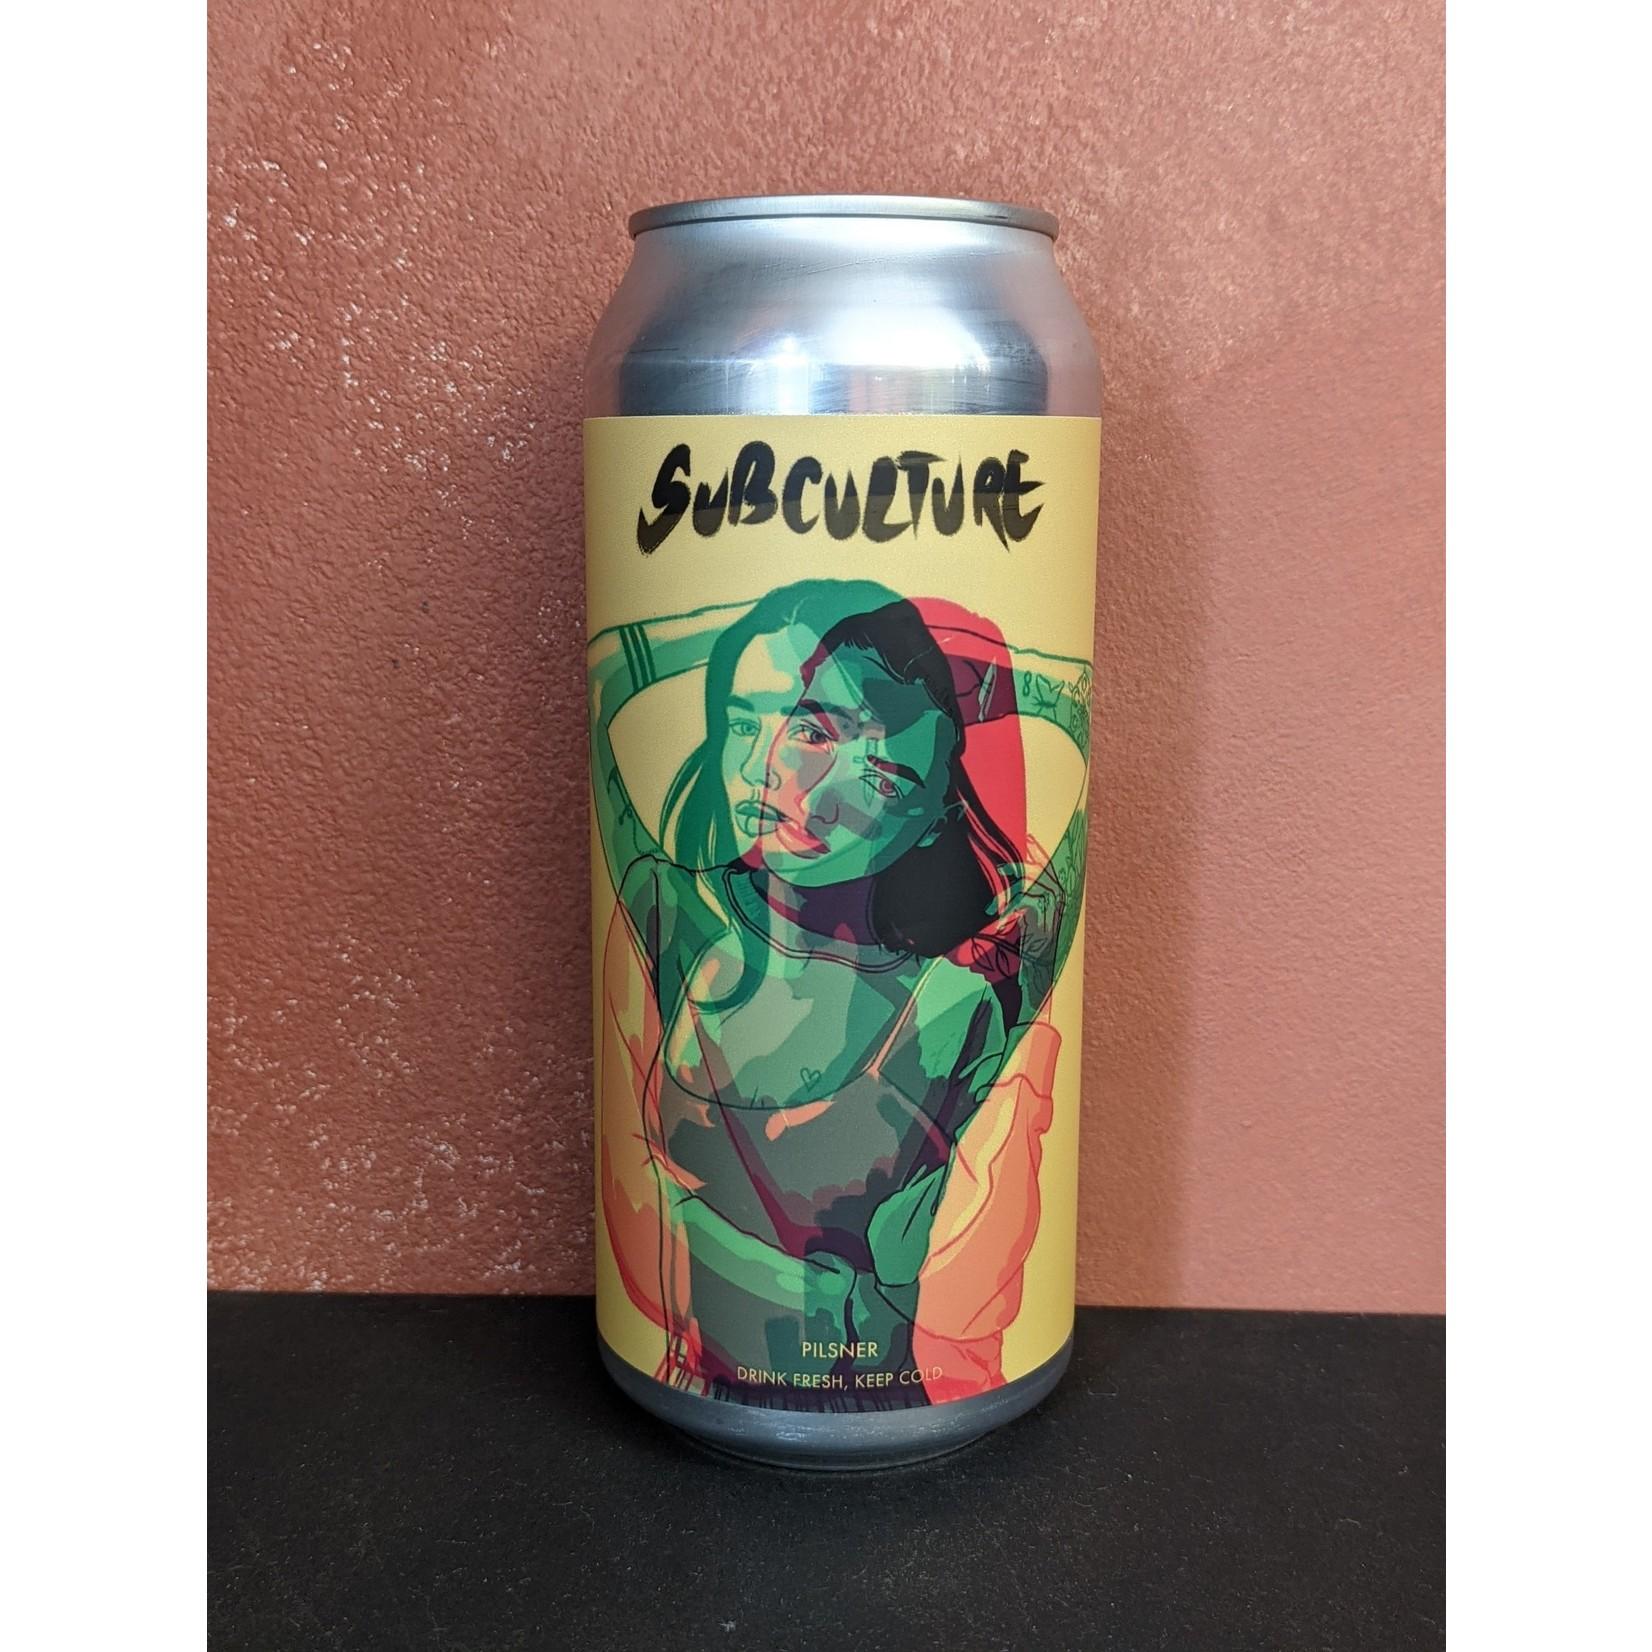 "Branch + Blade ""Subculture"" Czech Pils CAN"